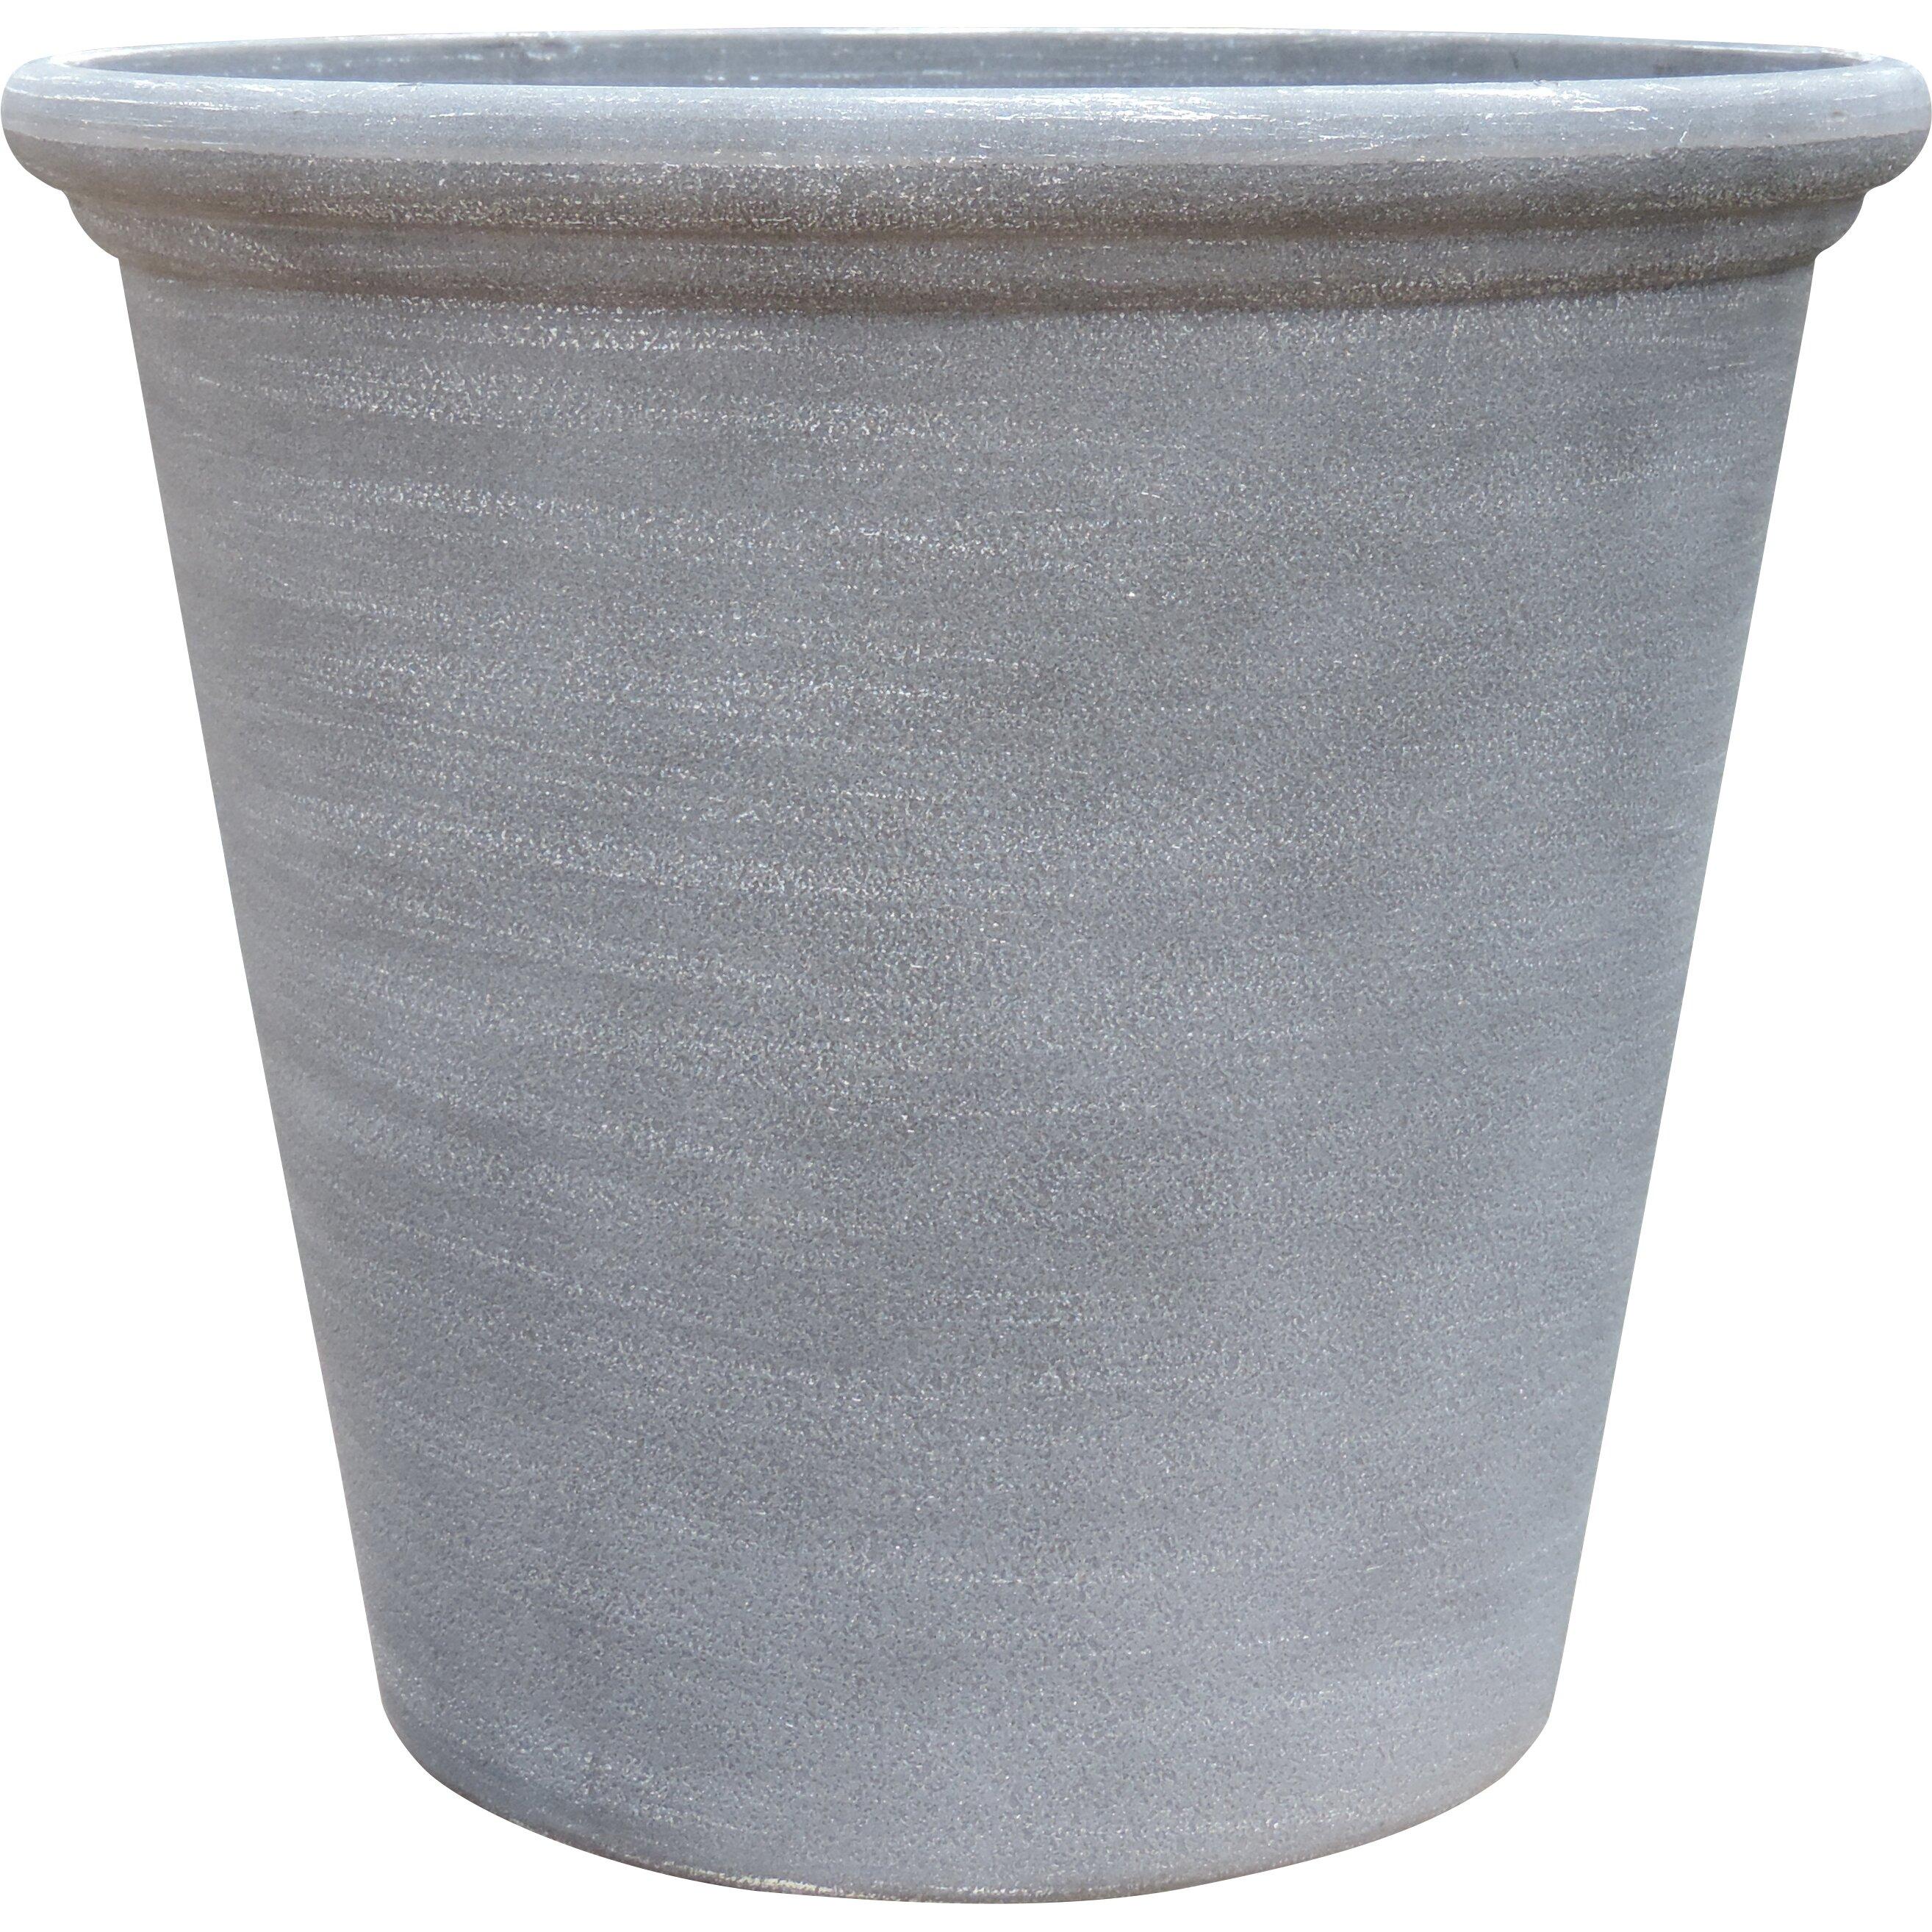 Griffith Creek Designs Round Pot Planter Amp Reviews Wayfair